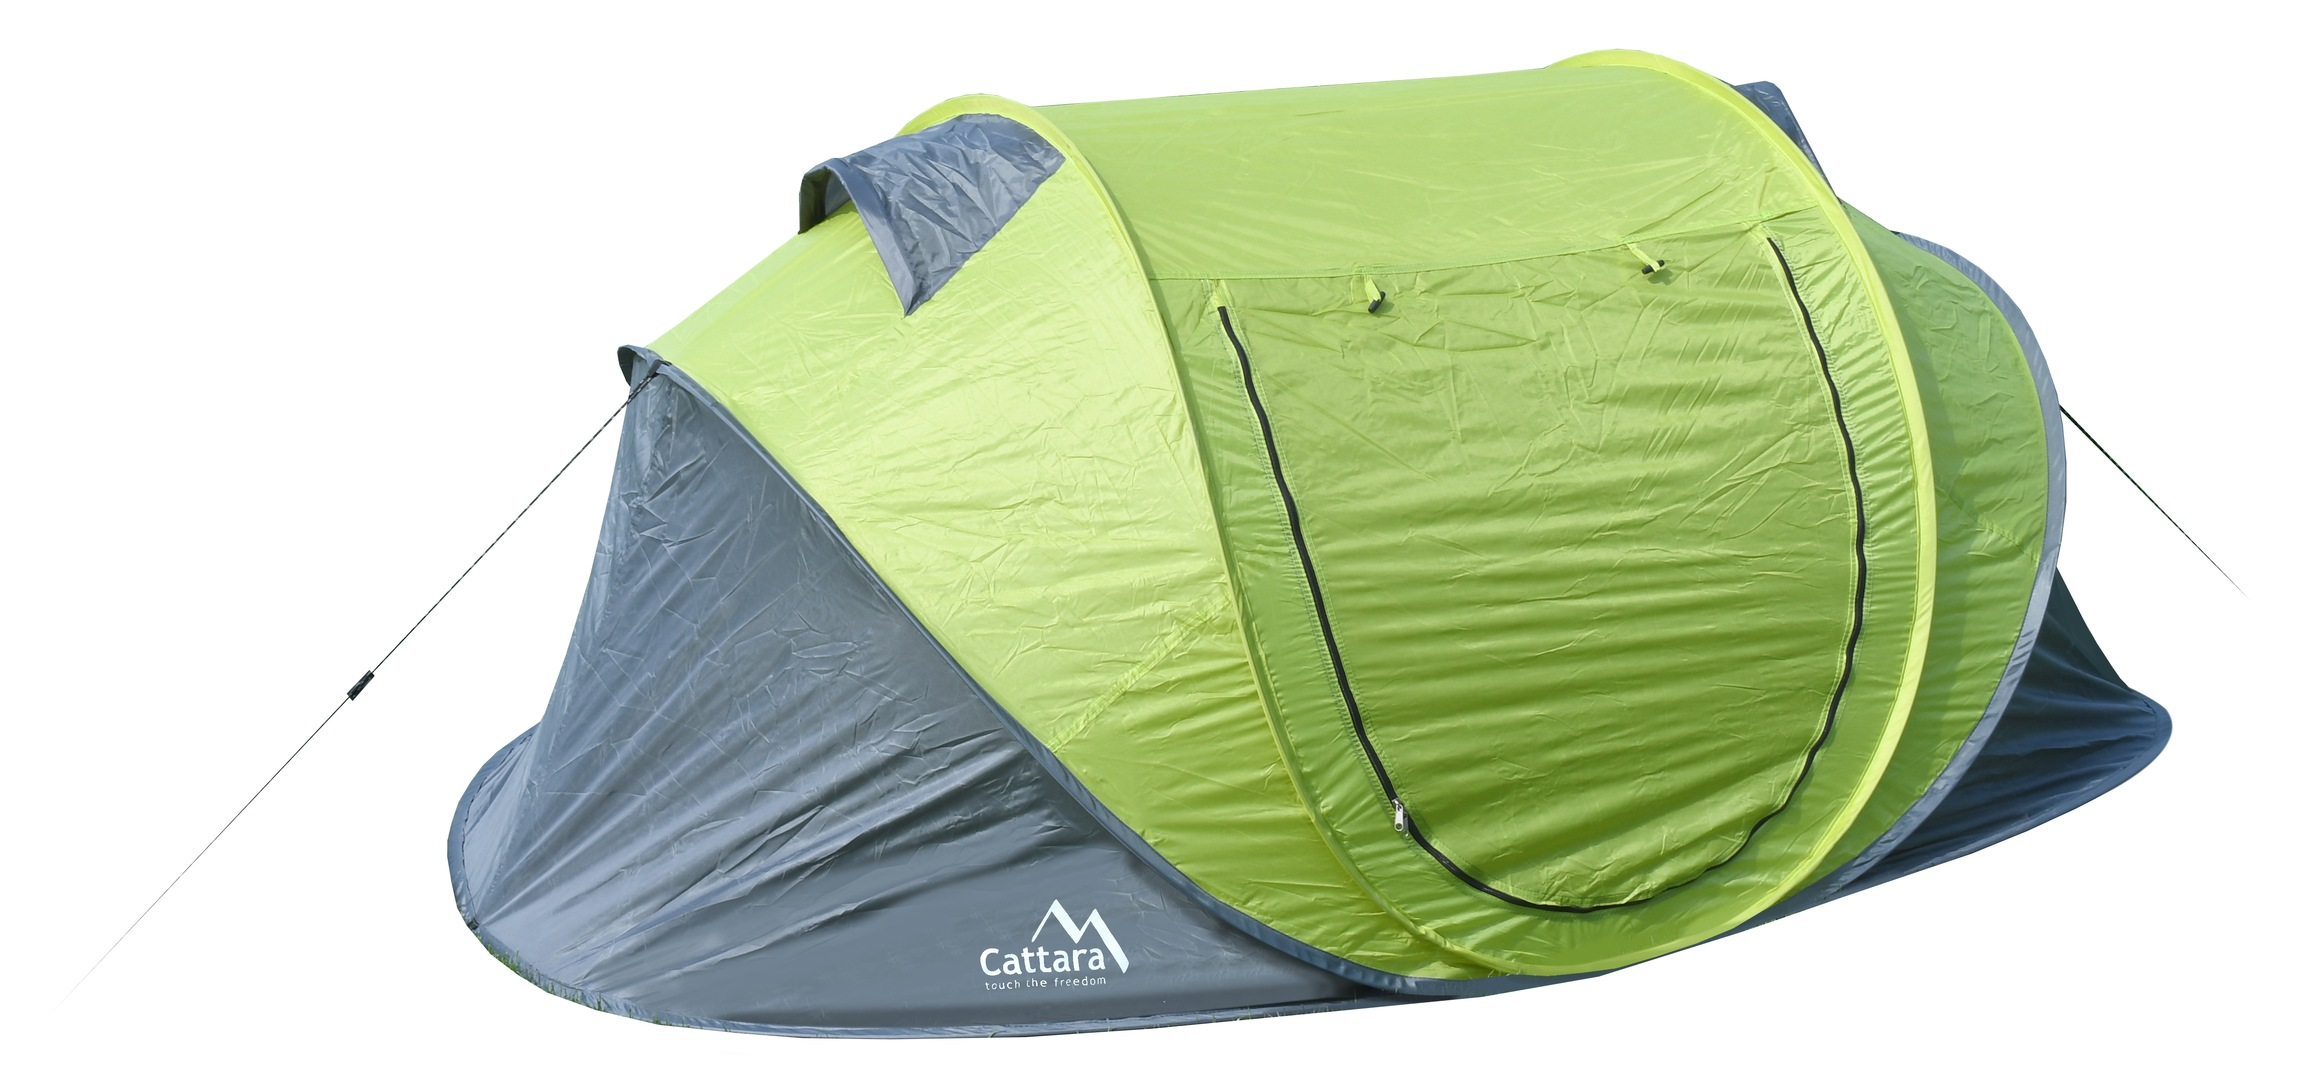 Cattara - Stan GARDA pro 2 osoby 230x130x95cm PU3000mm